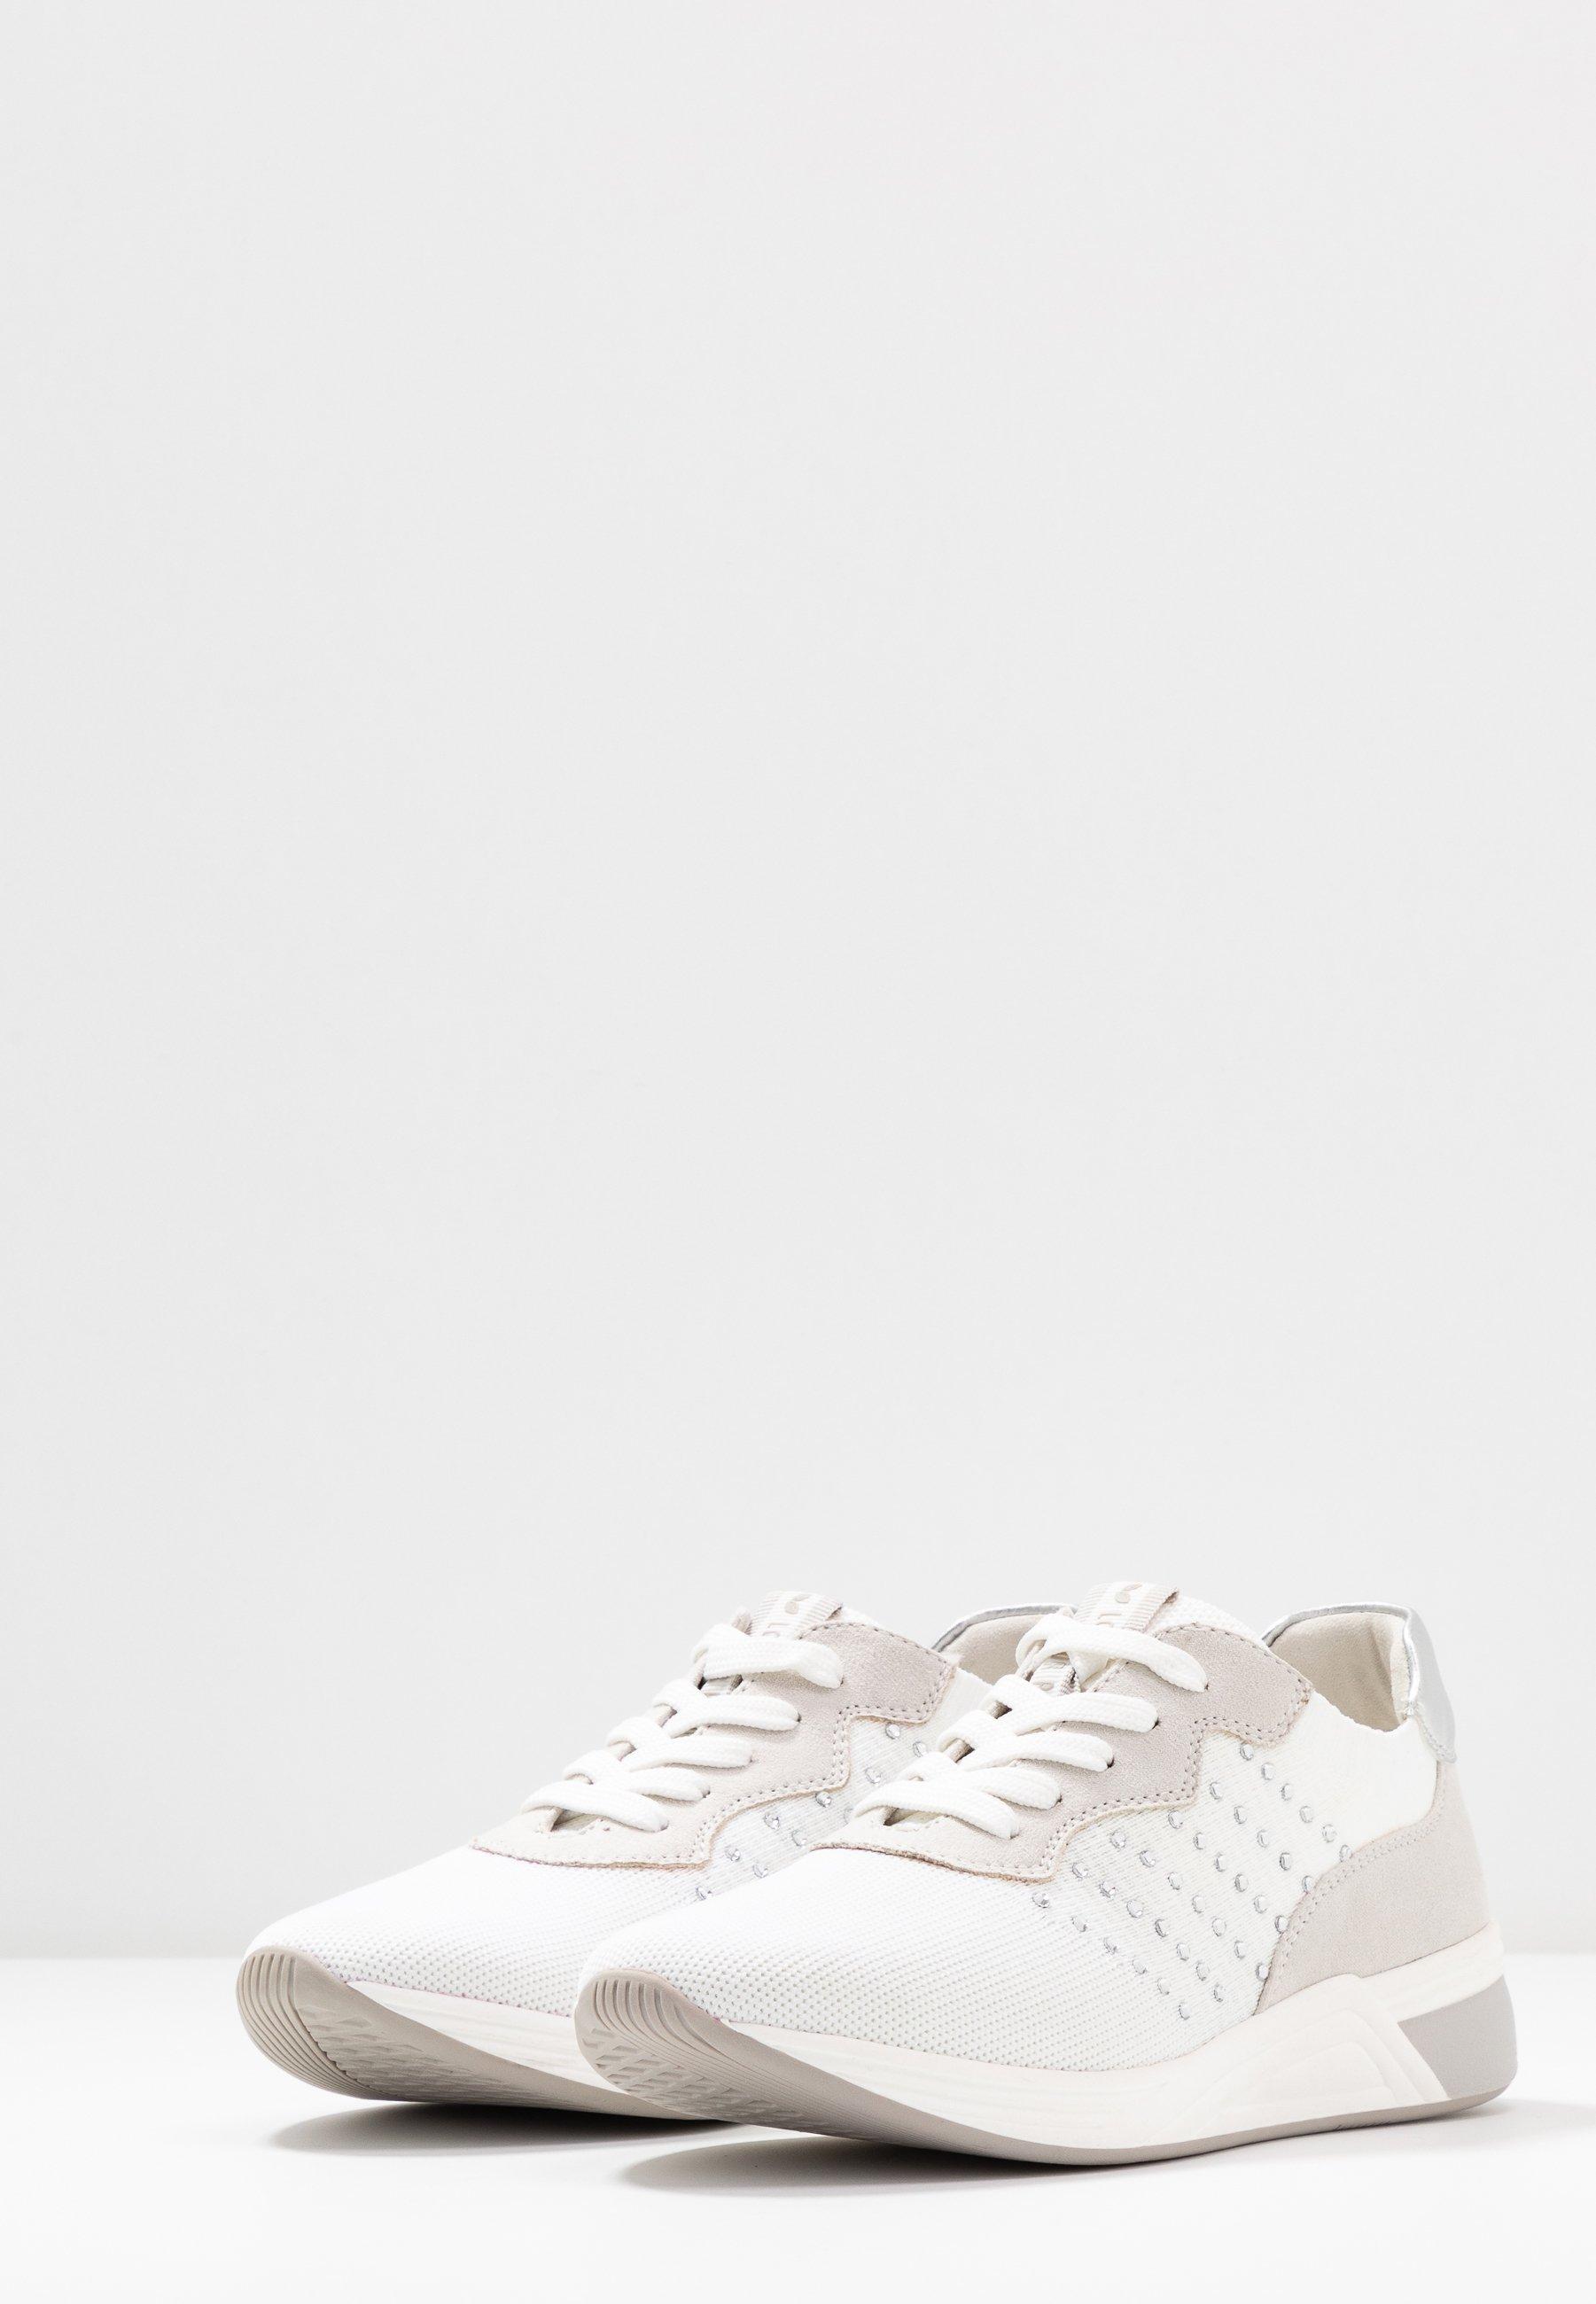 Marco Tozzi 2 2 23754 34 Sneaker low offwhite